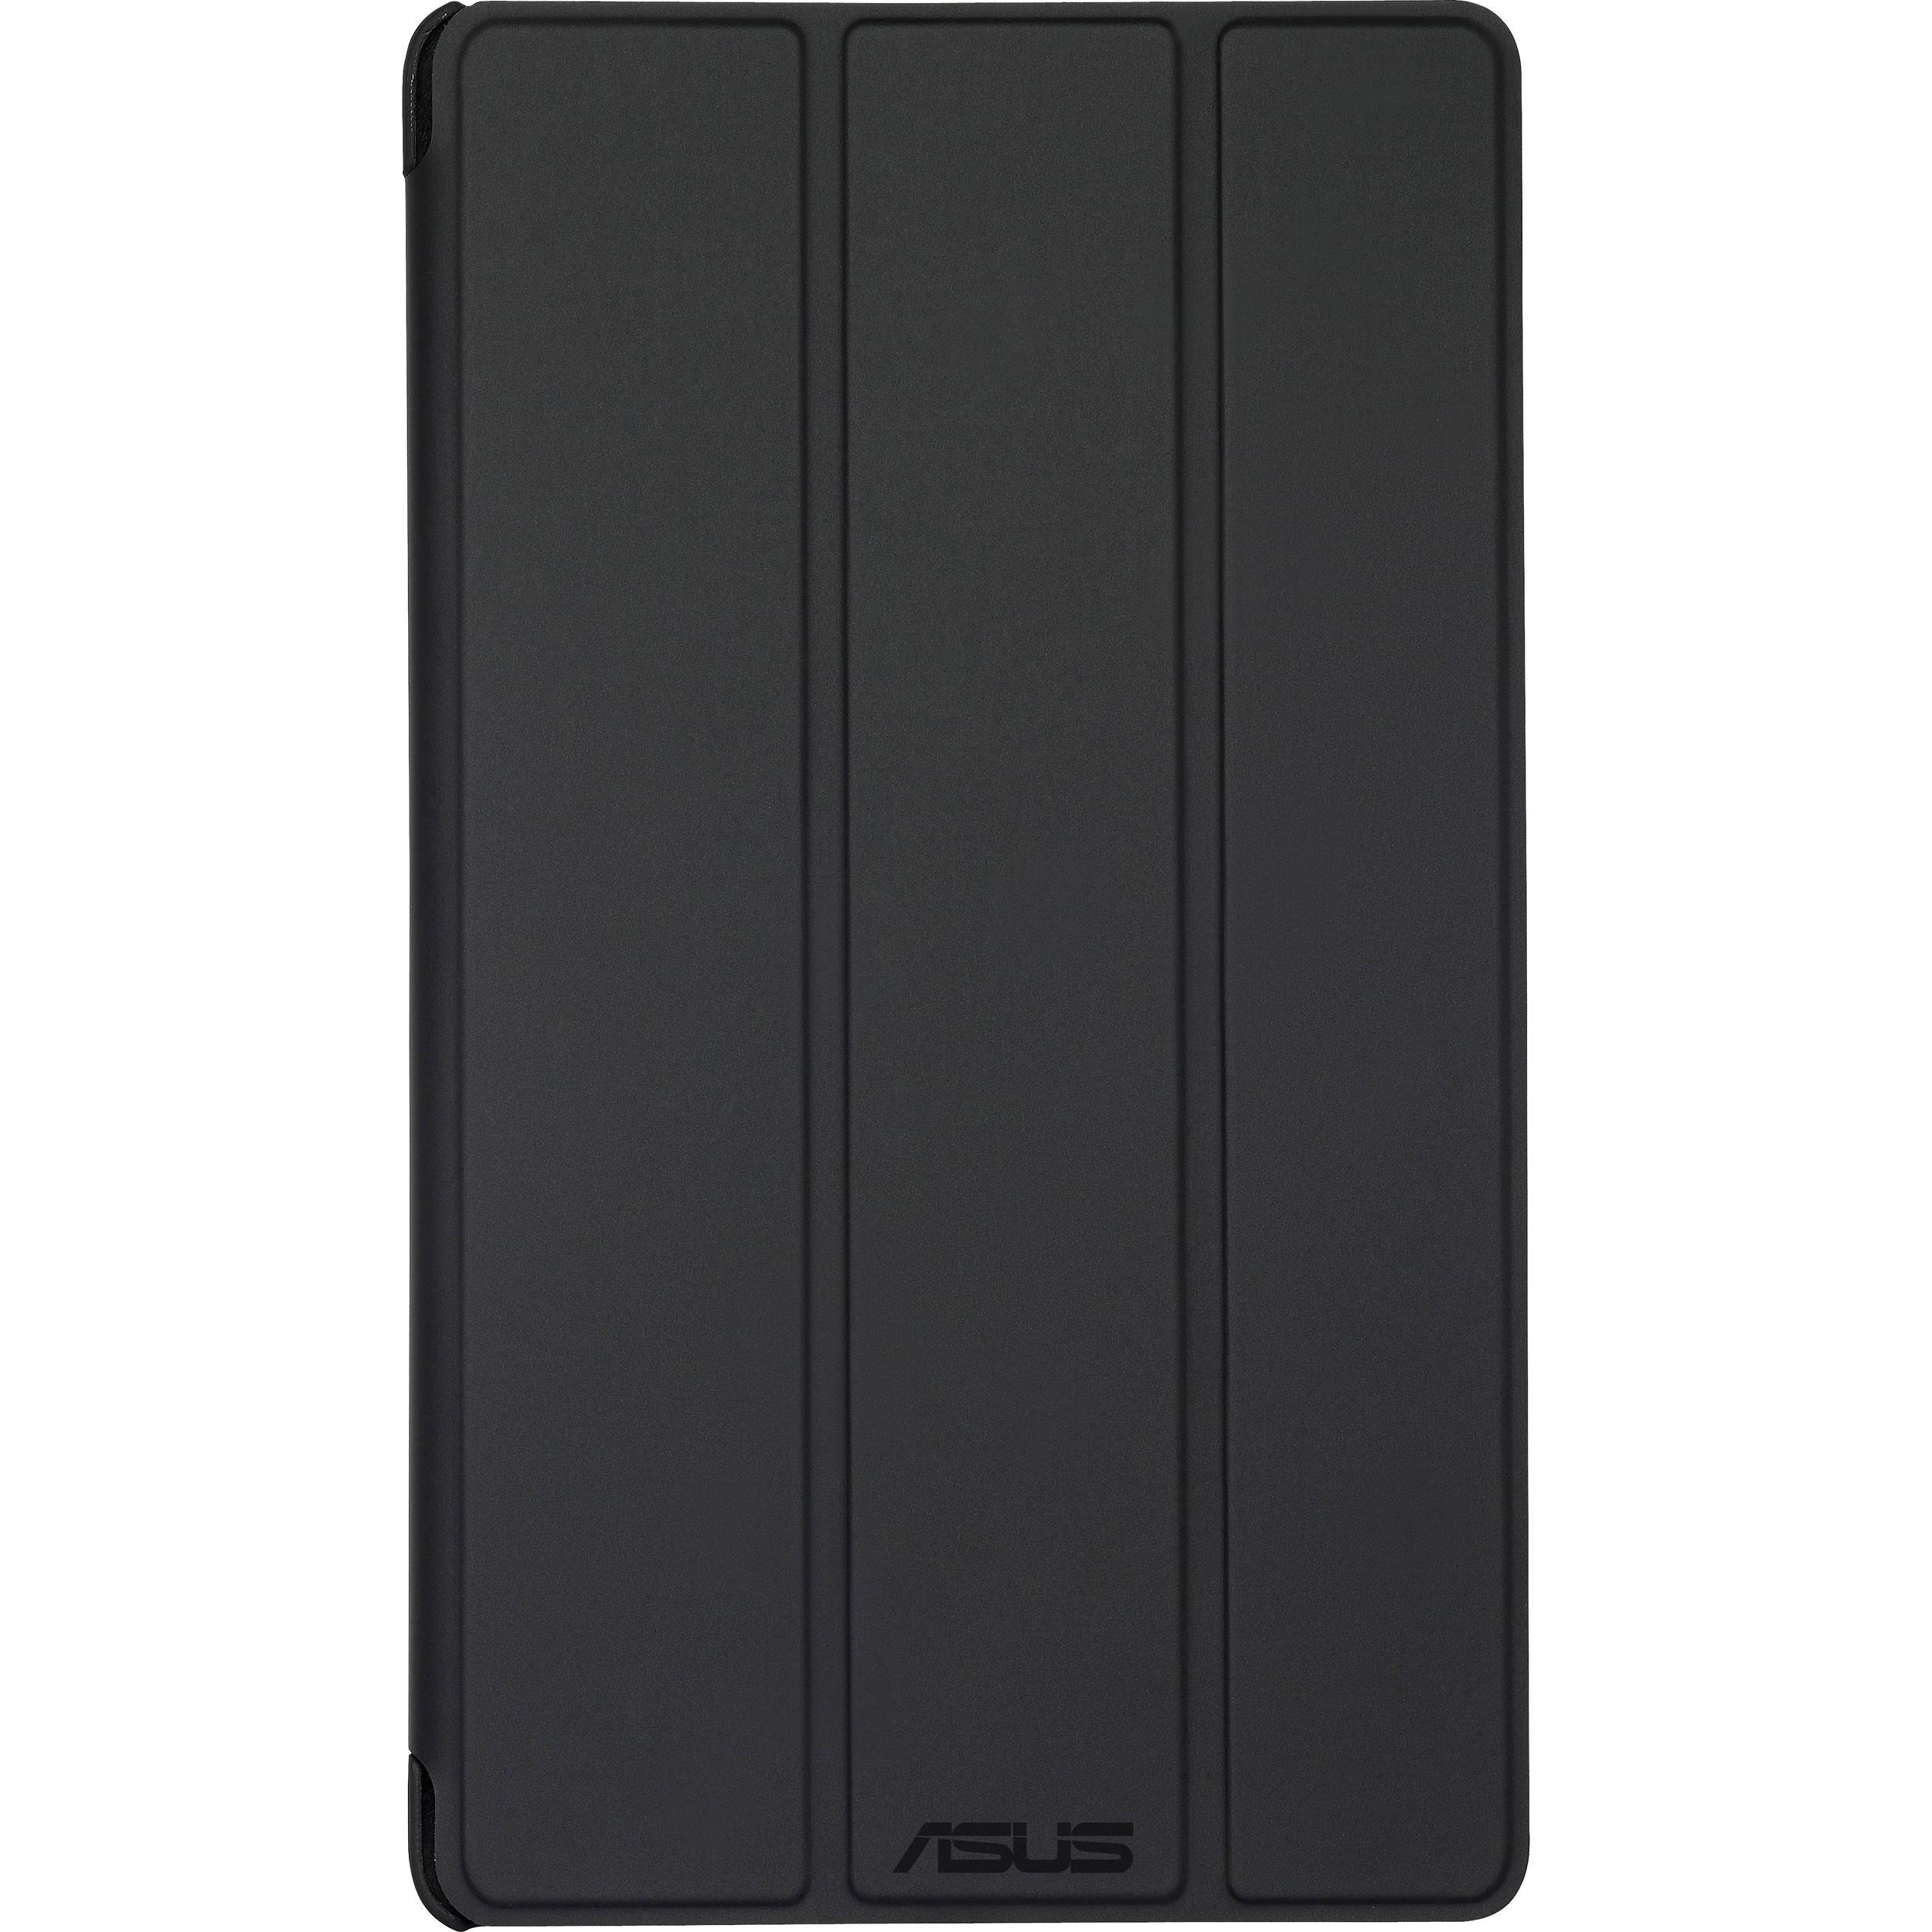 brand new 7bc80 989a0 ASUS Premium Cover for Nexus 7 2013 (Black)